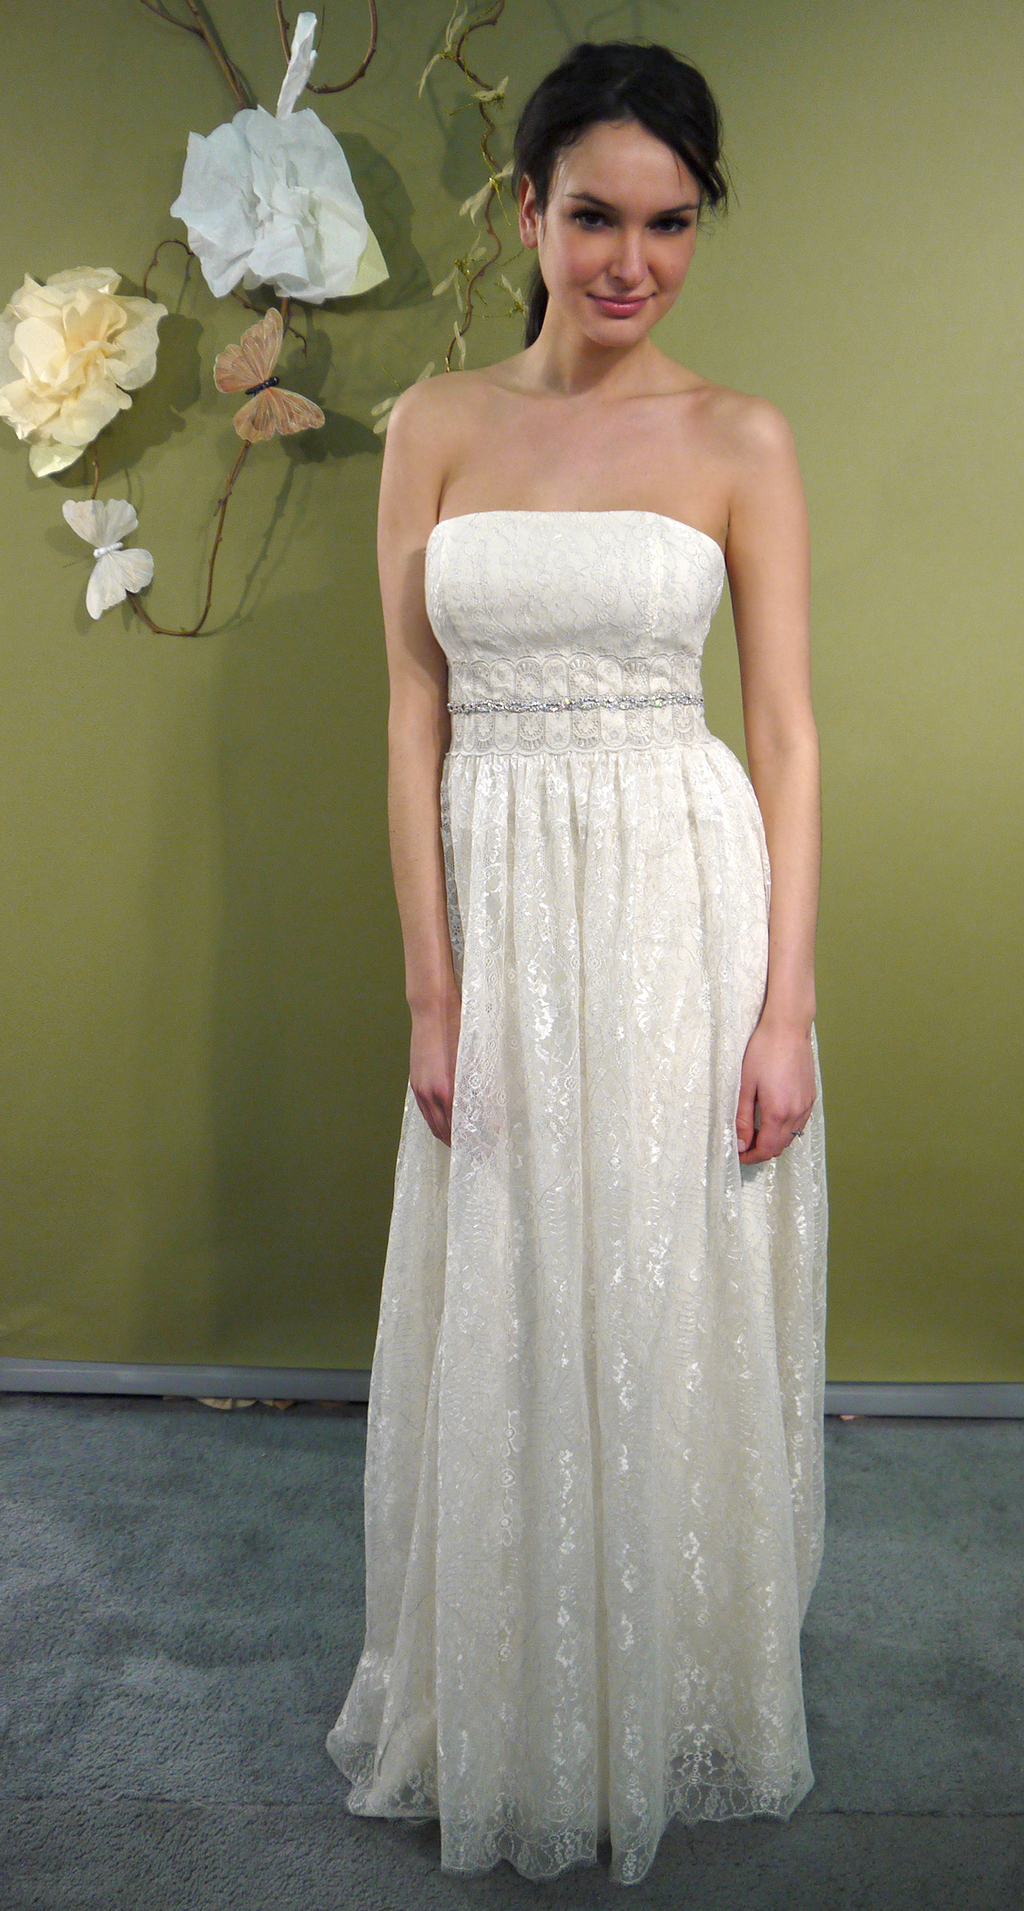 Claire Pettibone Strapless Wedding Dresses